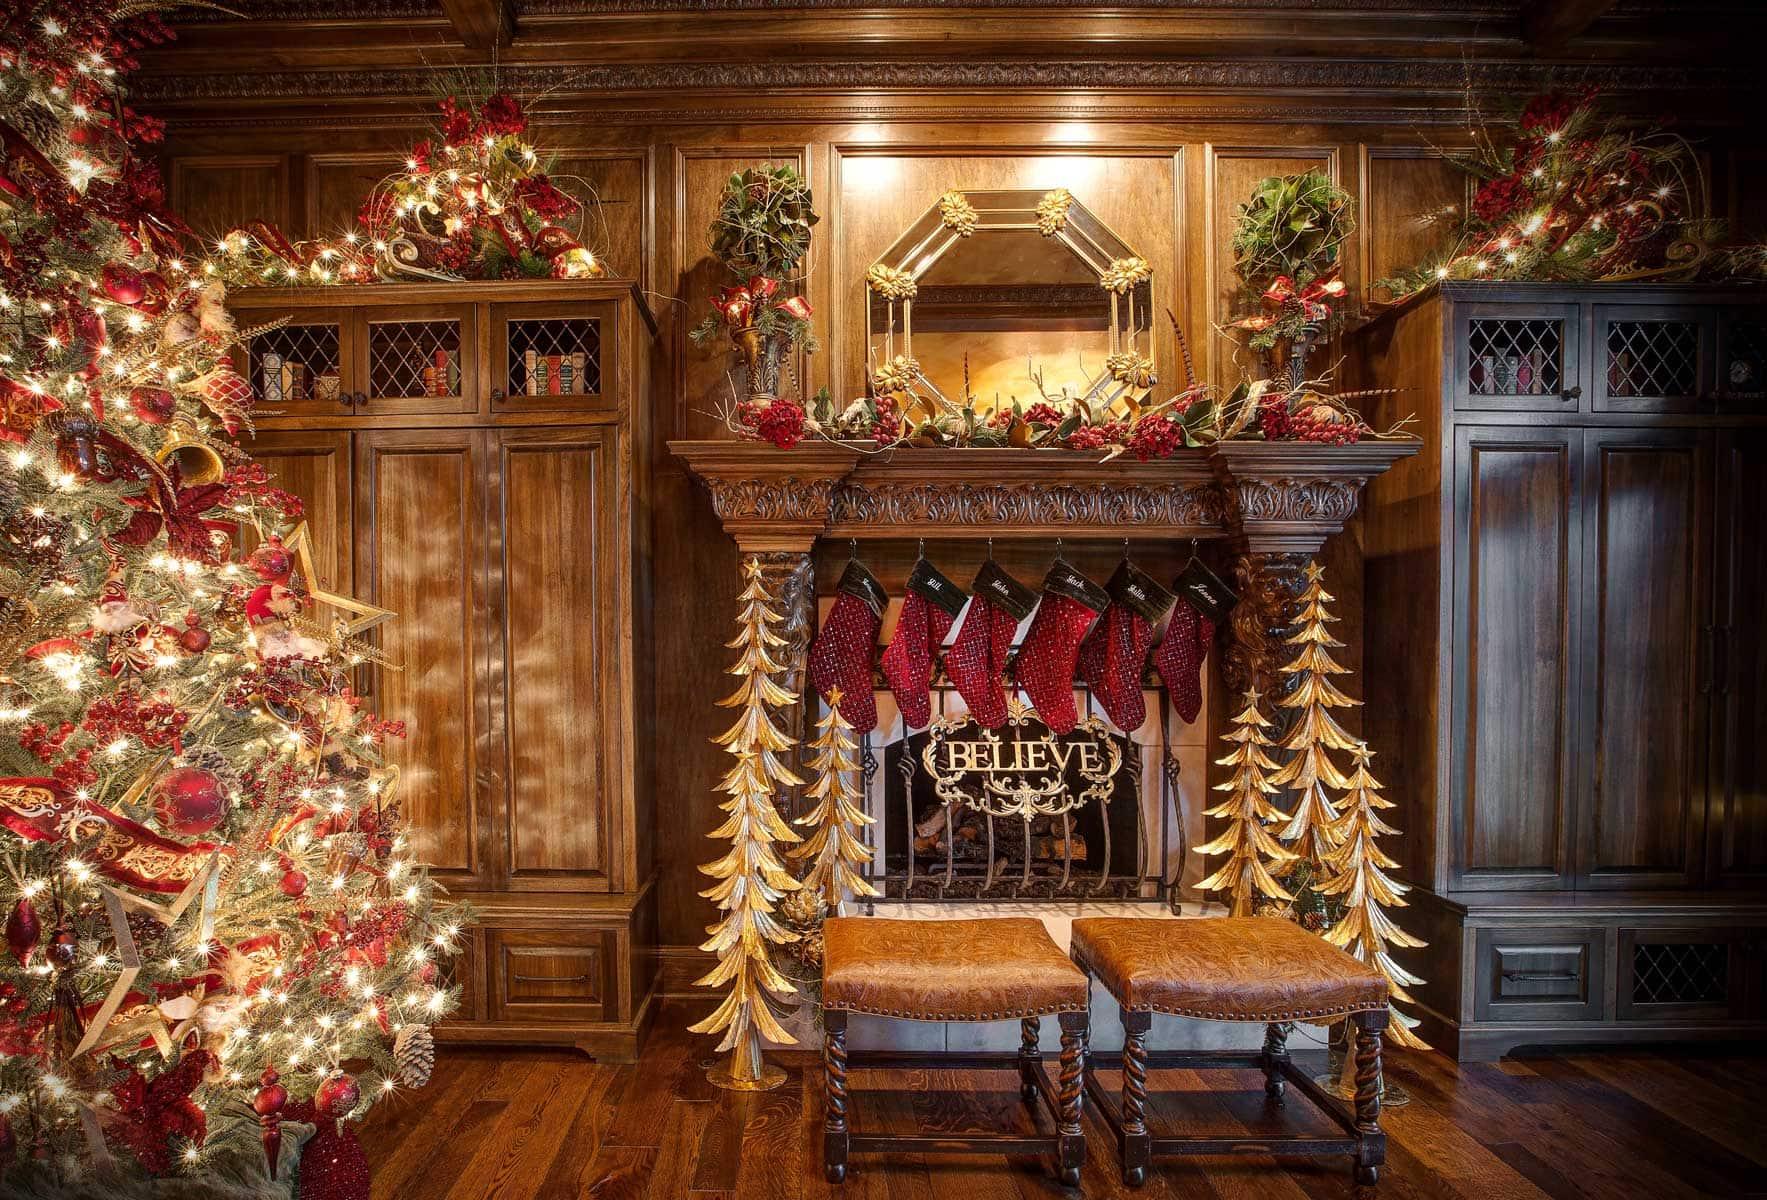 Christmas home decor linly designs for Christmas mural